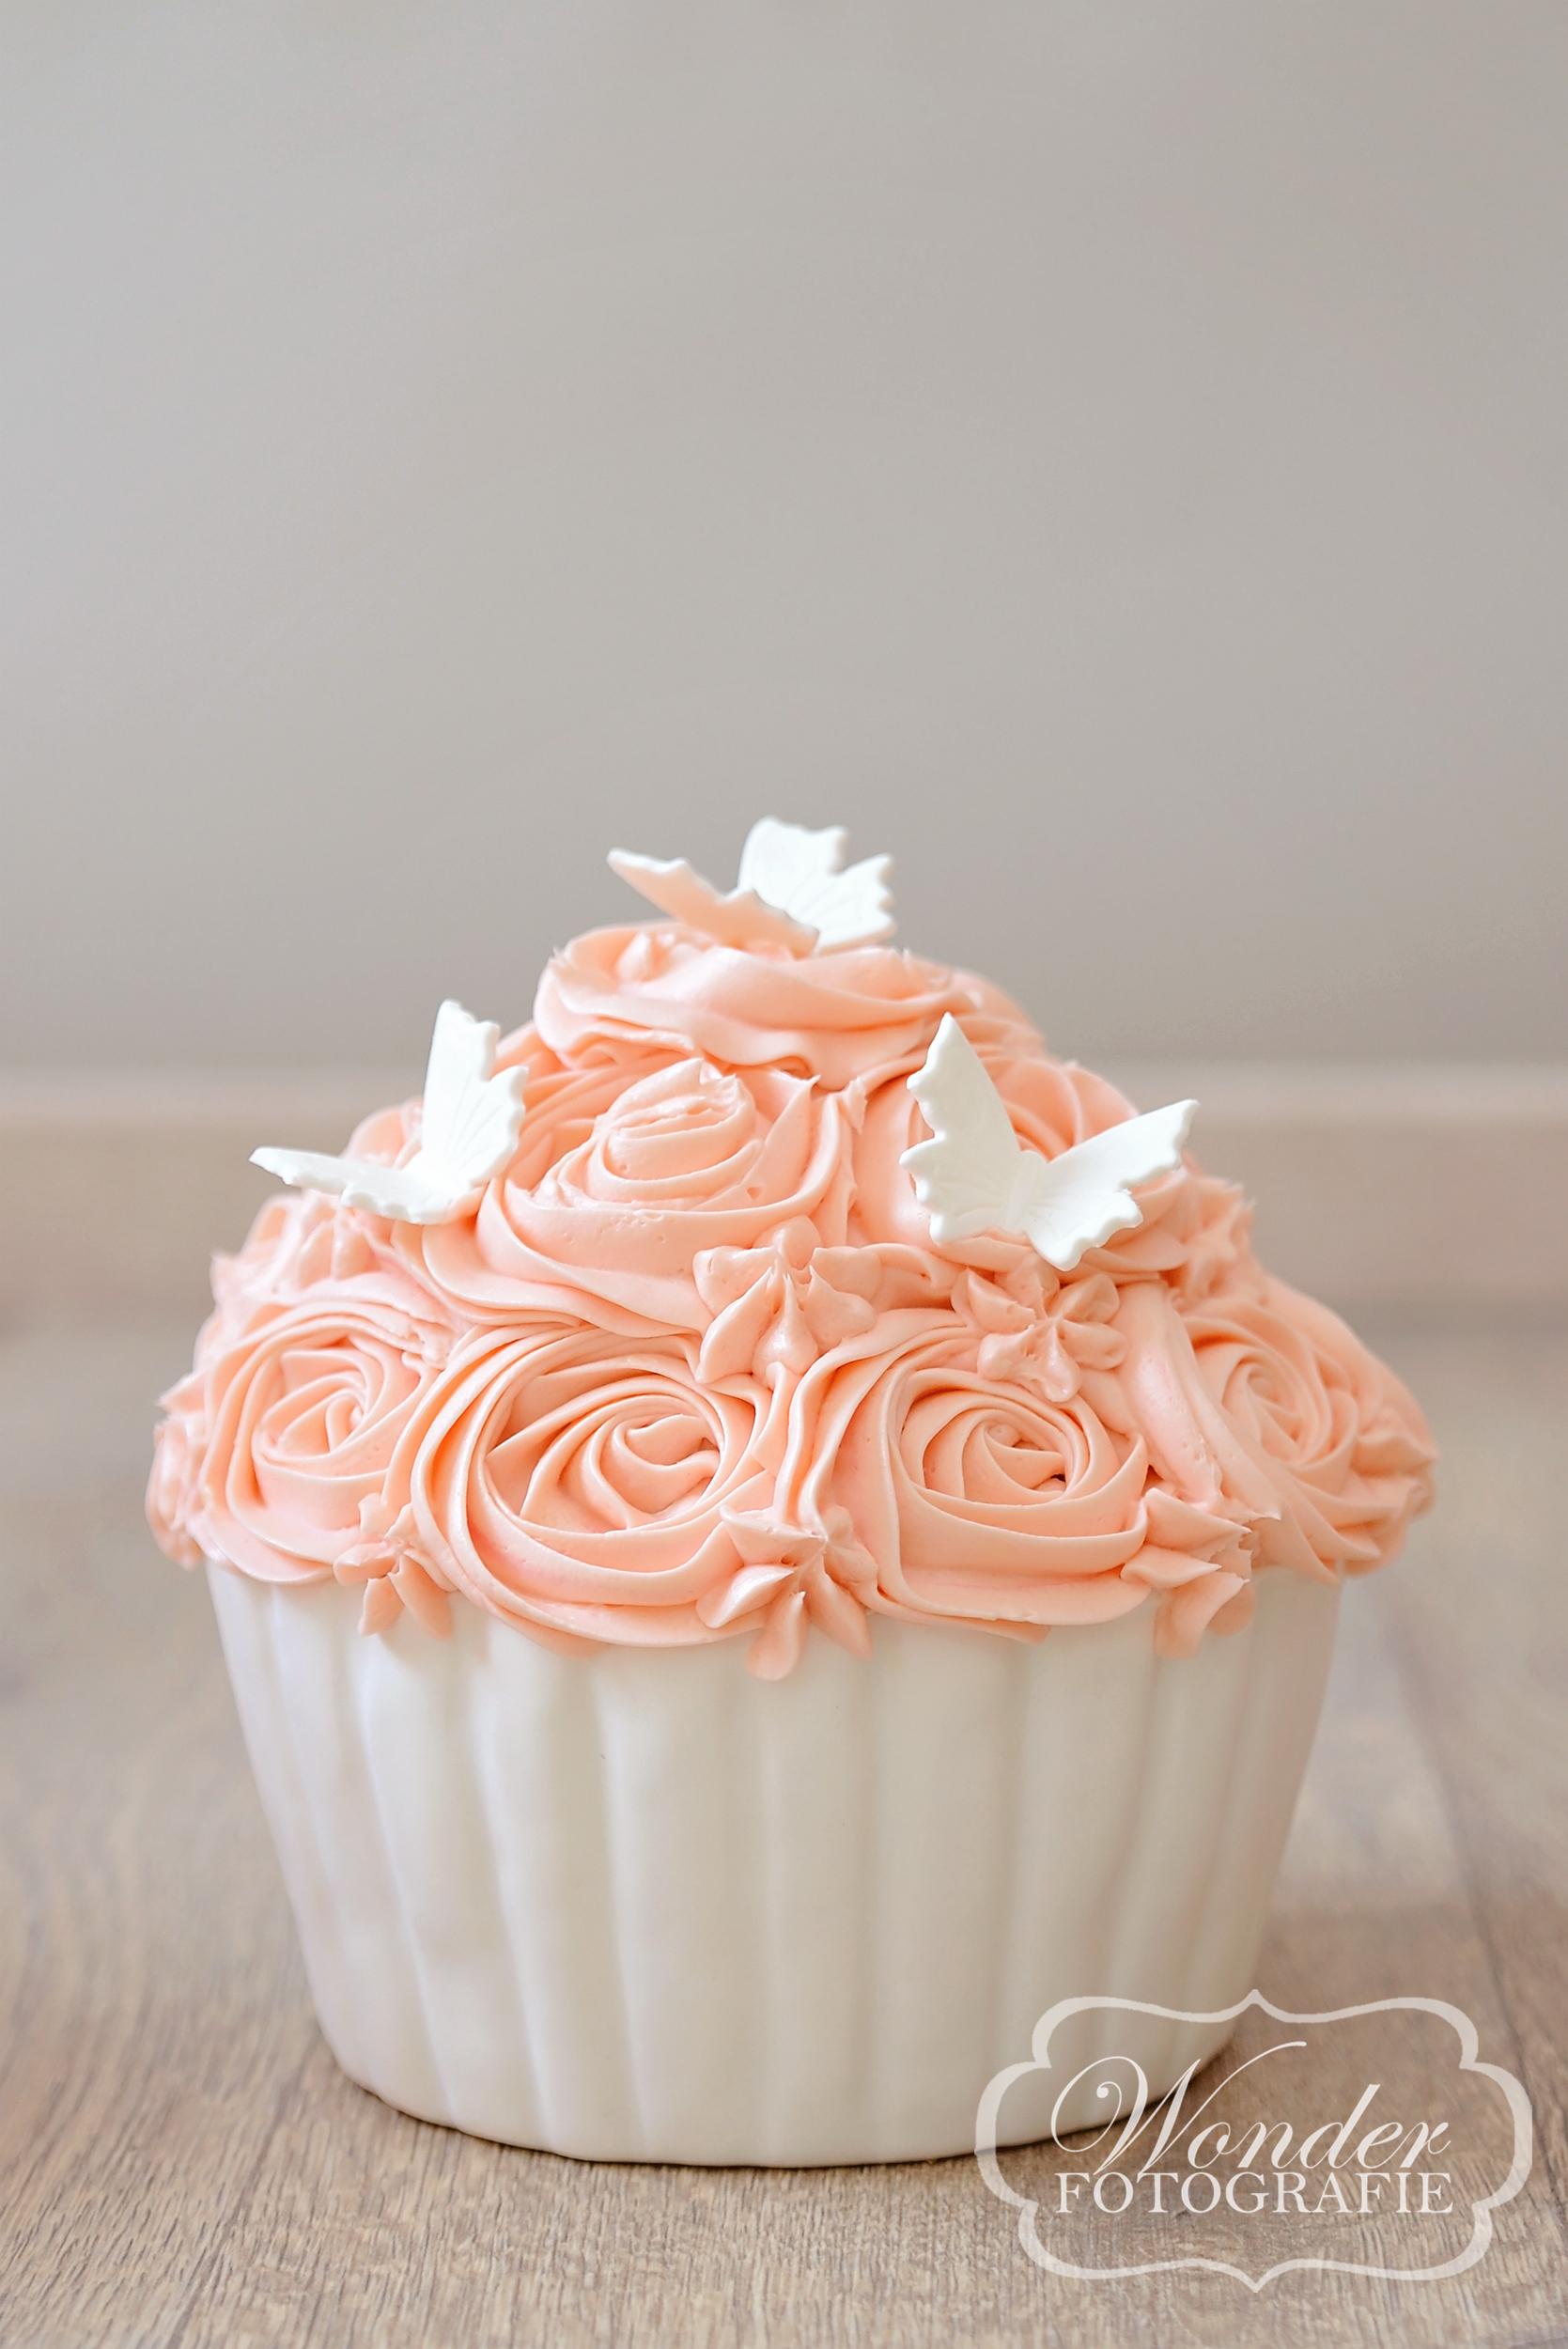 Cake Smash Zalm - Wonder Fotografie